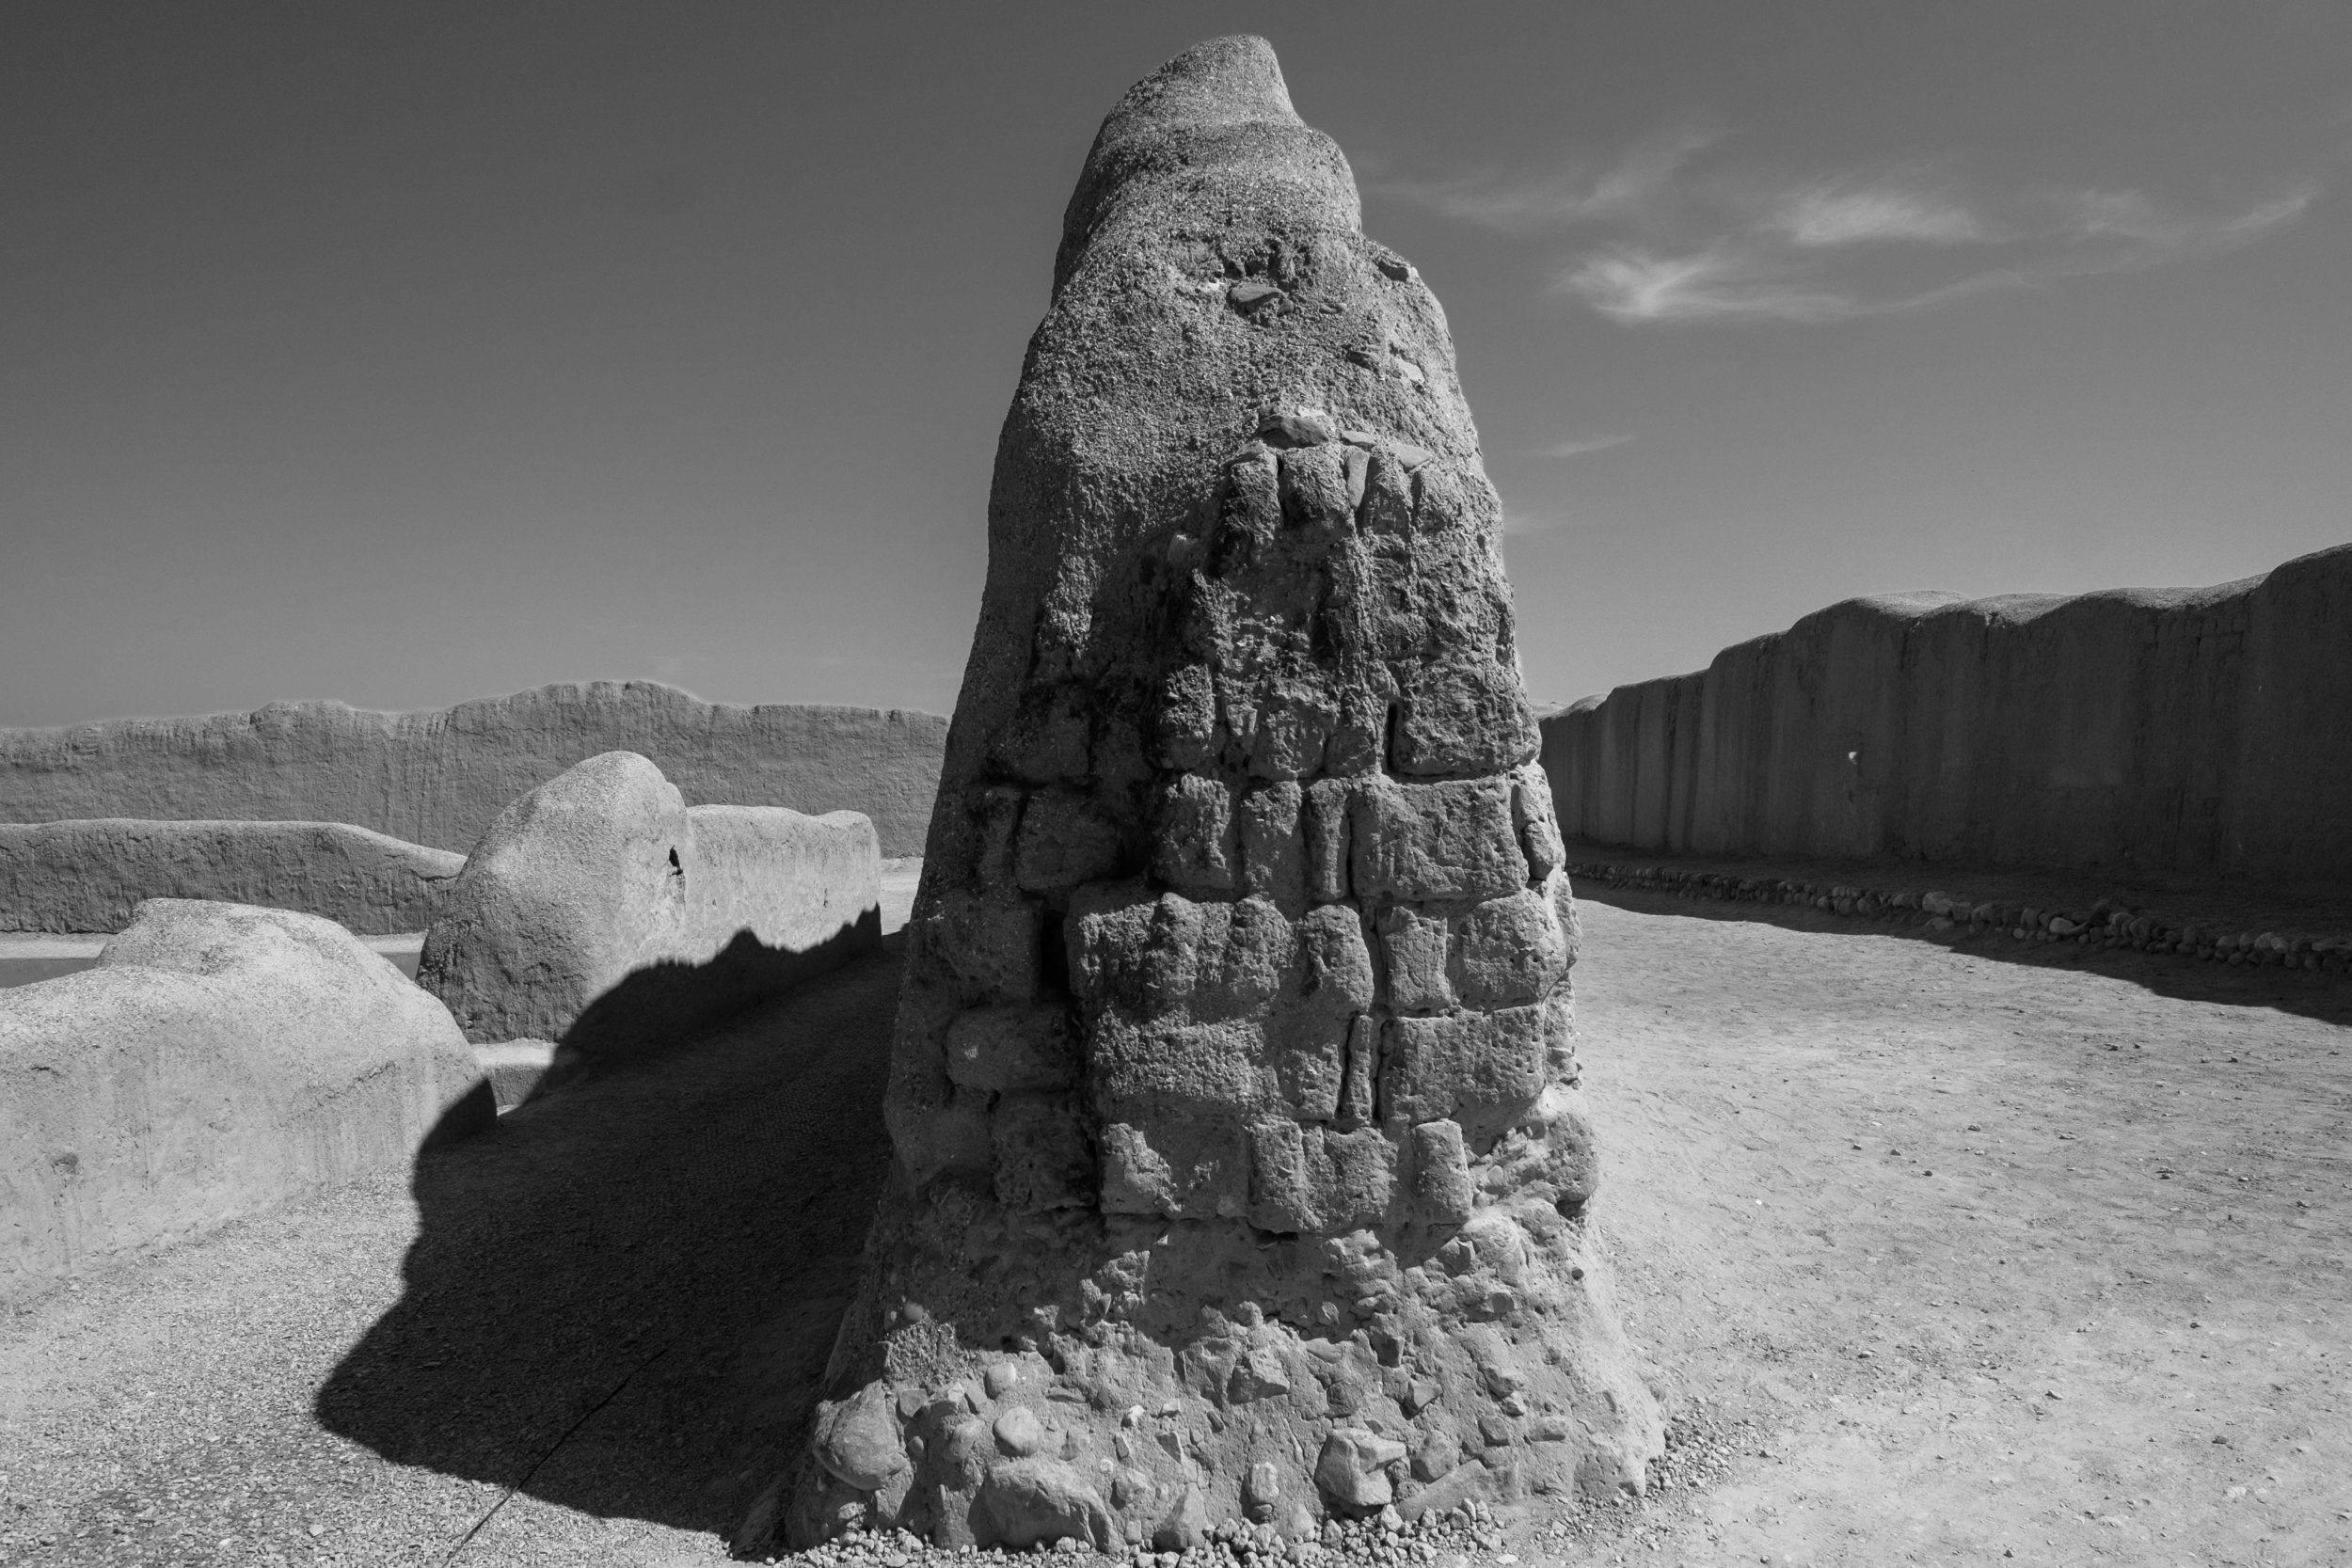 Chan Chan Ruins off Huanchaco, Peru, where ETIV do Brasil has a partner NGO